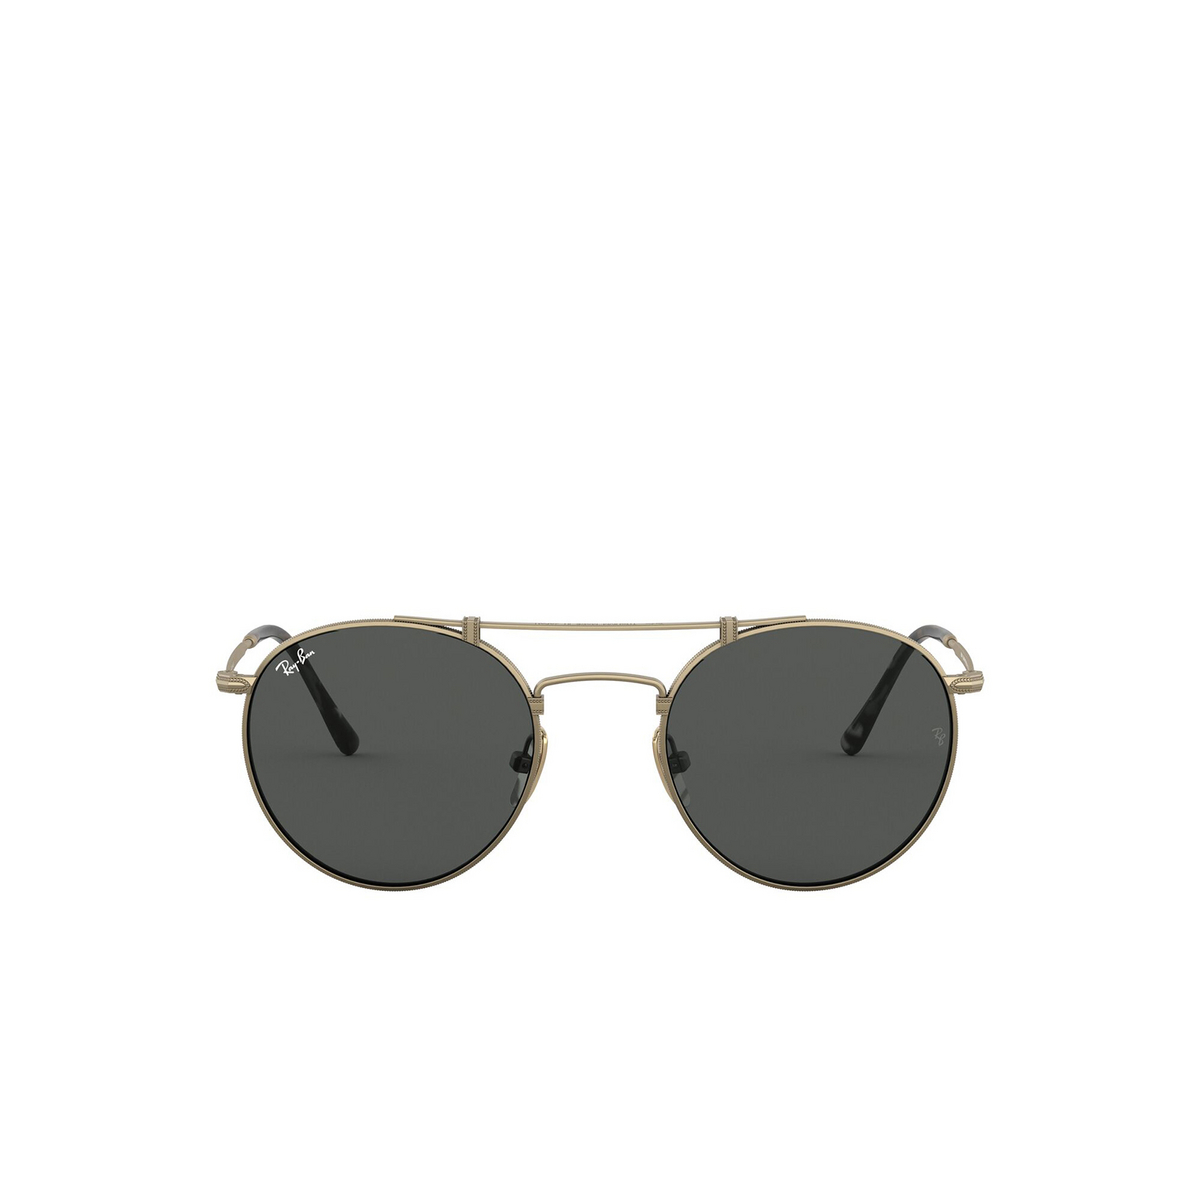 Ray-Ban® Round Sunglasses: Titanium RB8147 color Demi Gloss Antique Arista 913757 - front view.